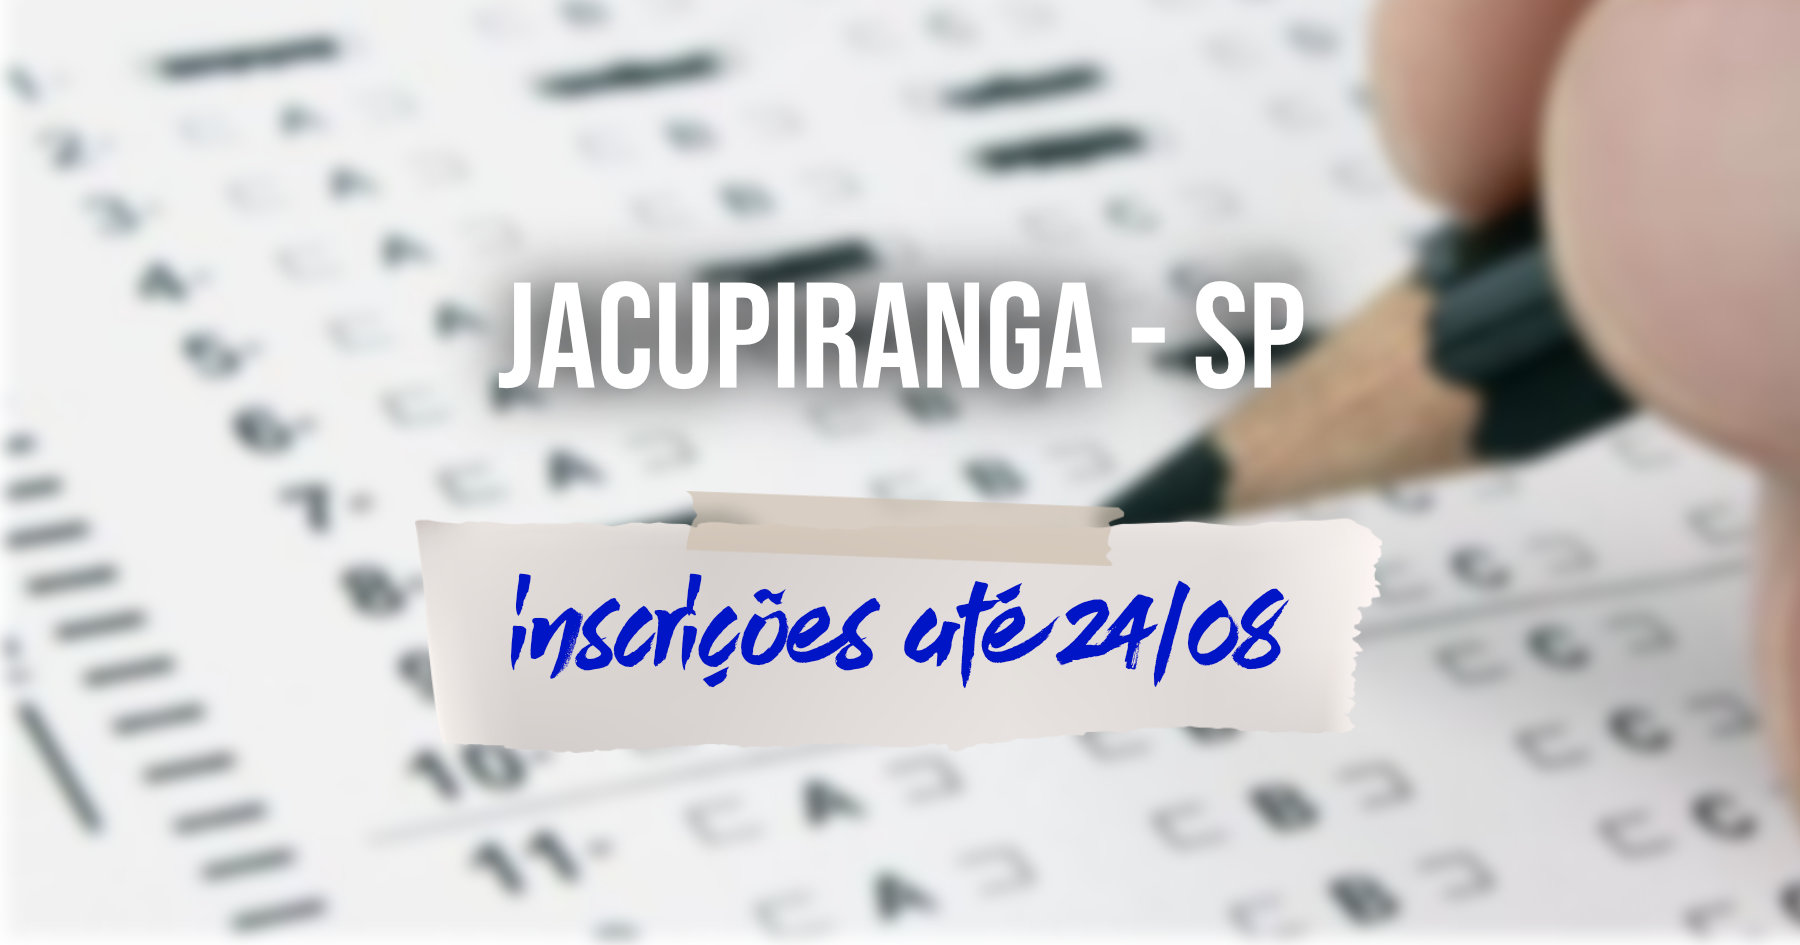 Concurso   Jacupiranga (SP) divulga edital